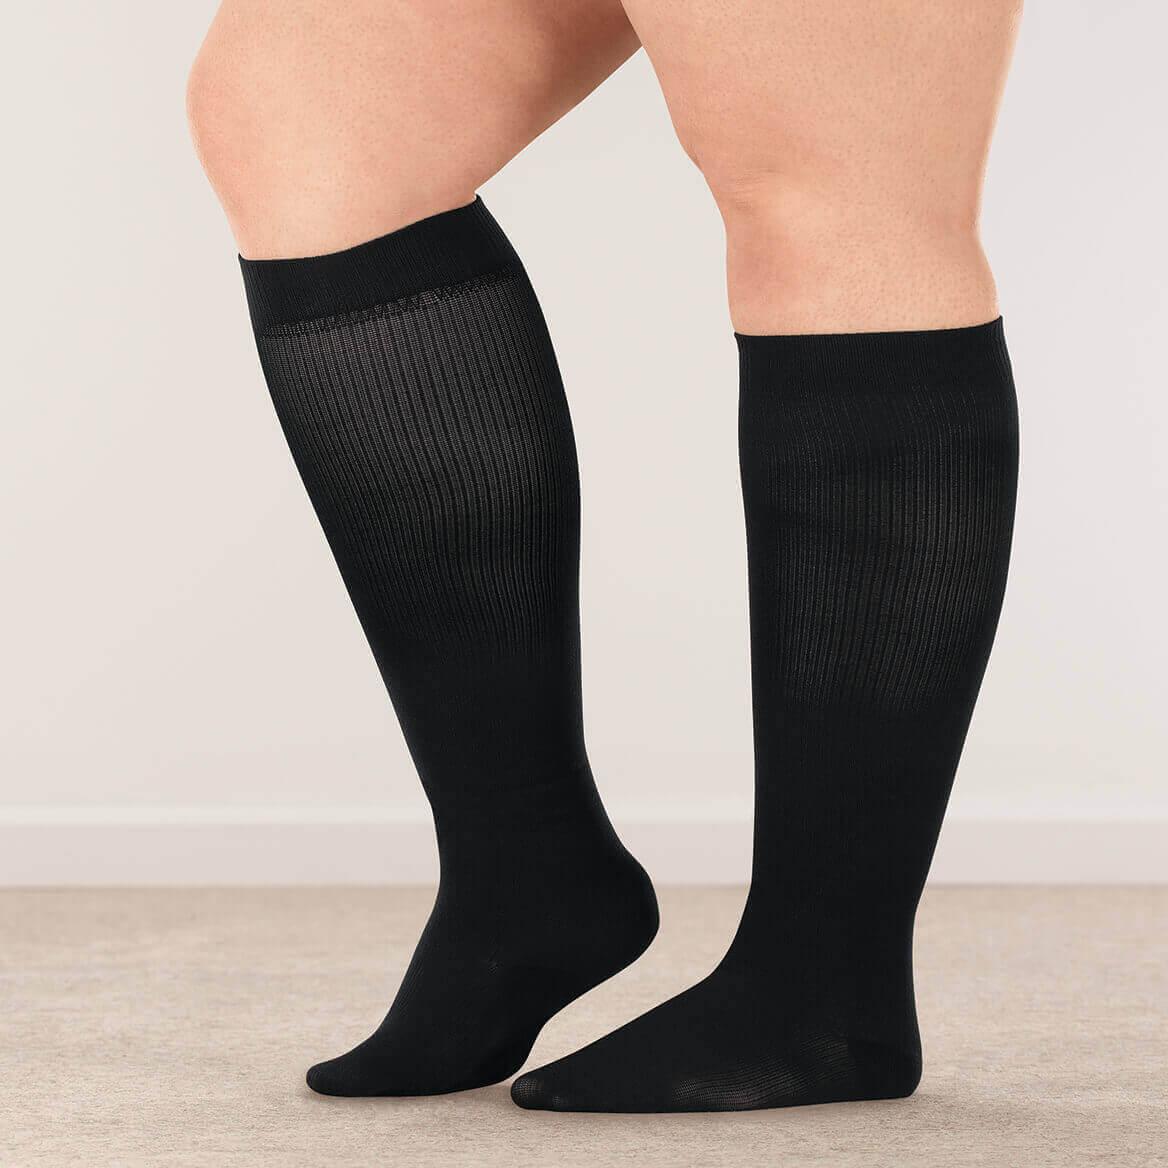 03a06bea4a ... Silver Steps™ Wide Calf Compression Socks, 15–20 mmHg-358895